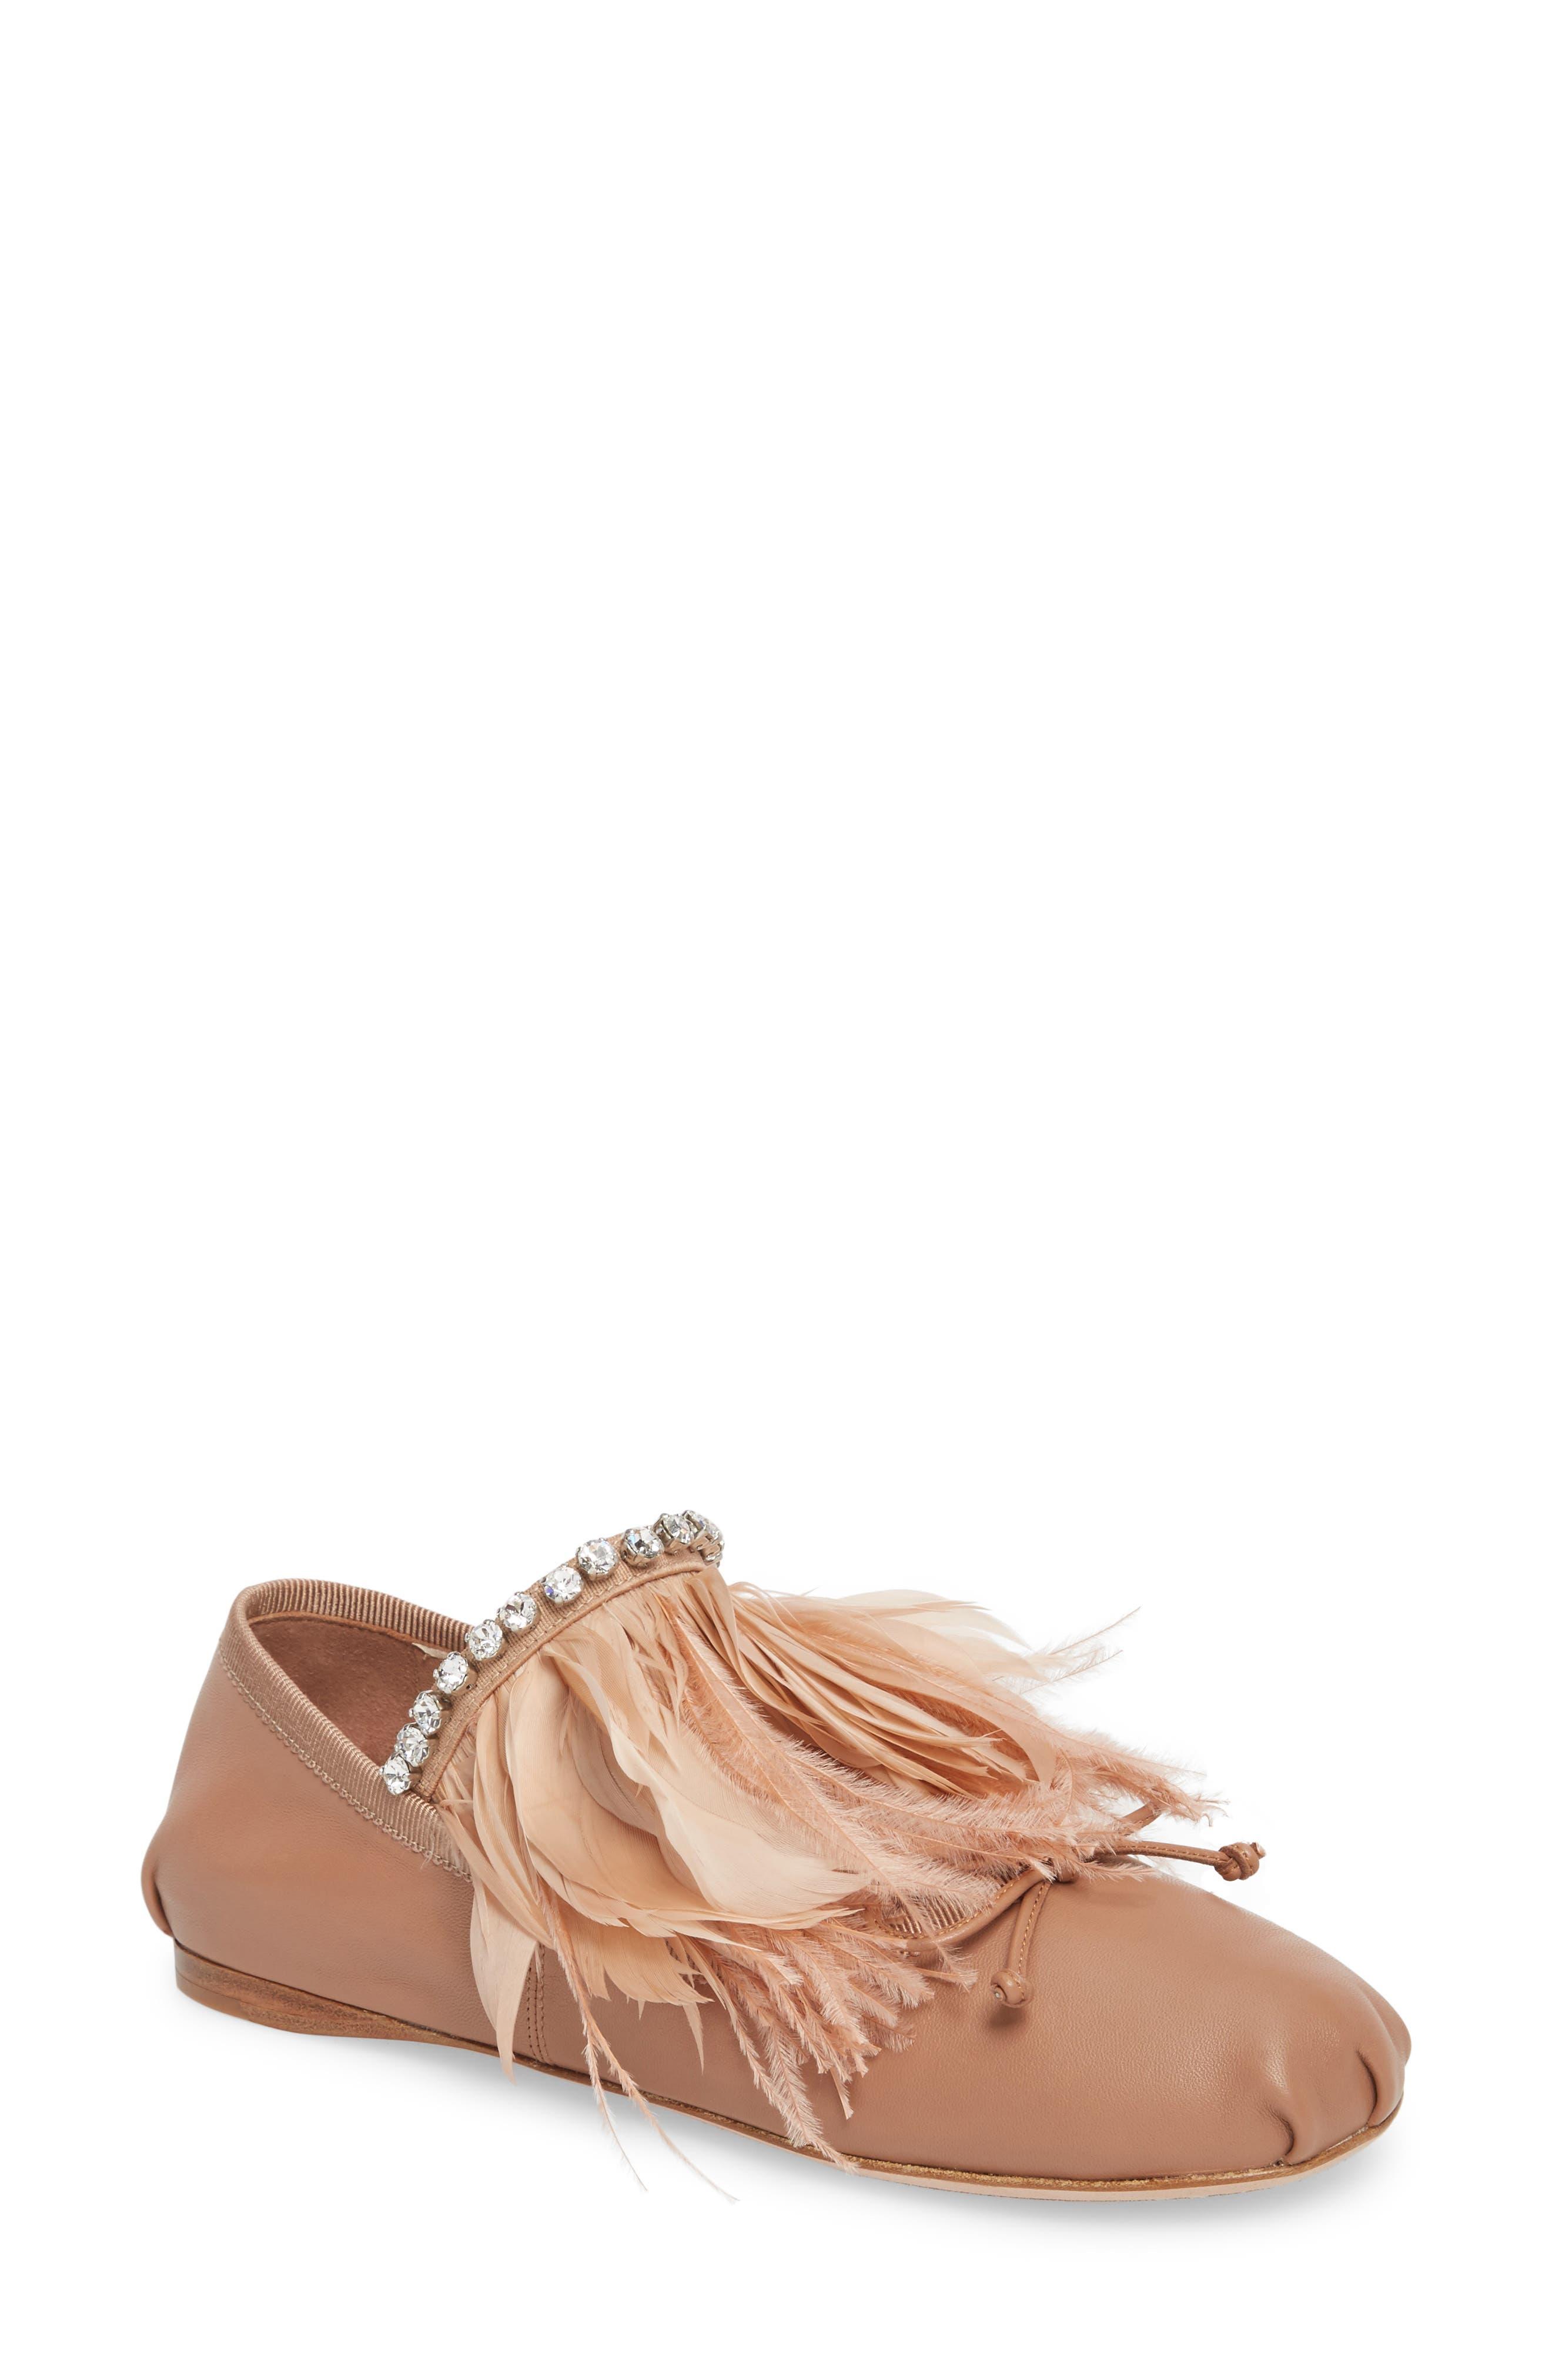 Feather Embellished Ballet Flat,                         Main,                         color, 650